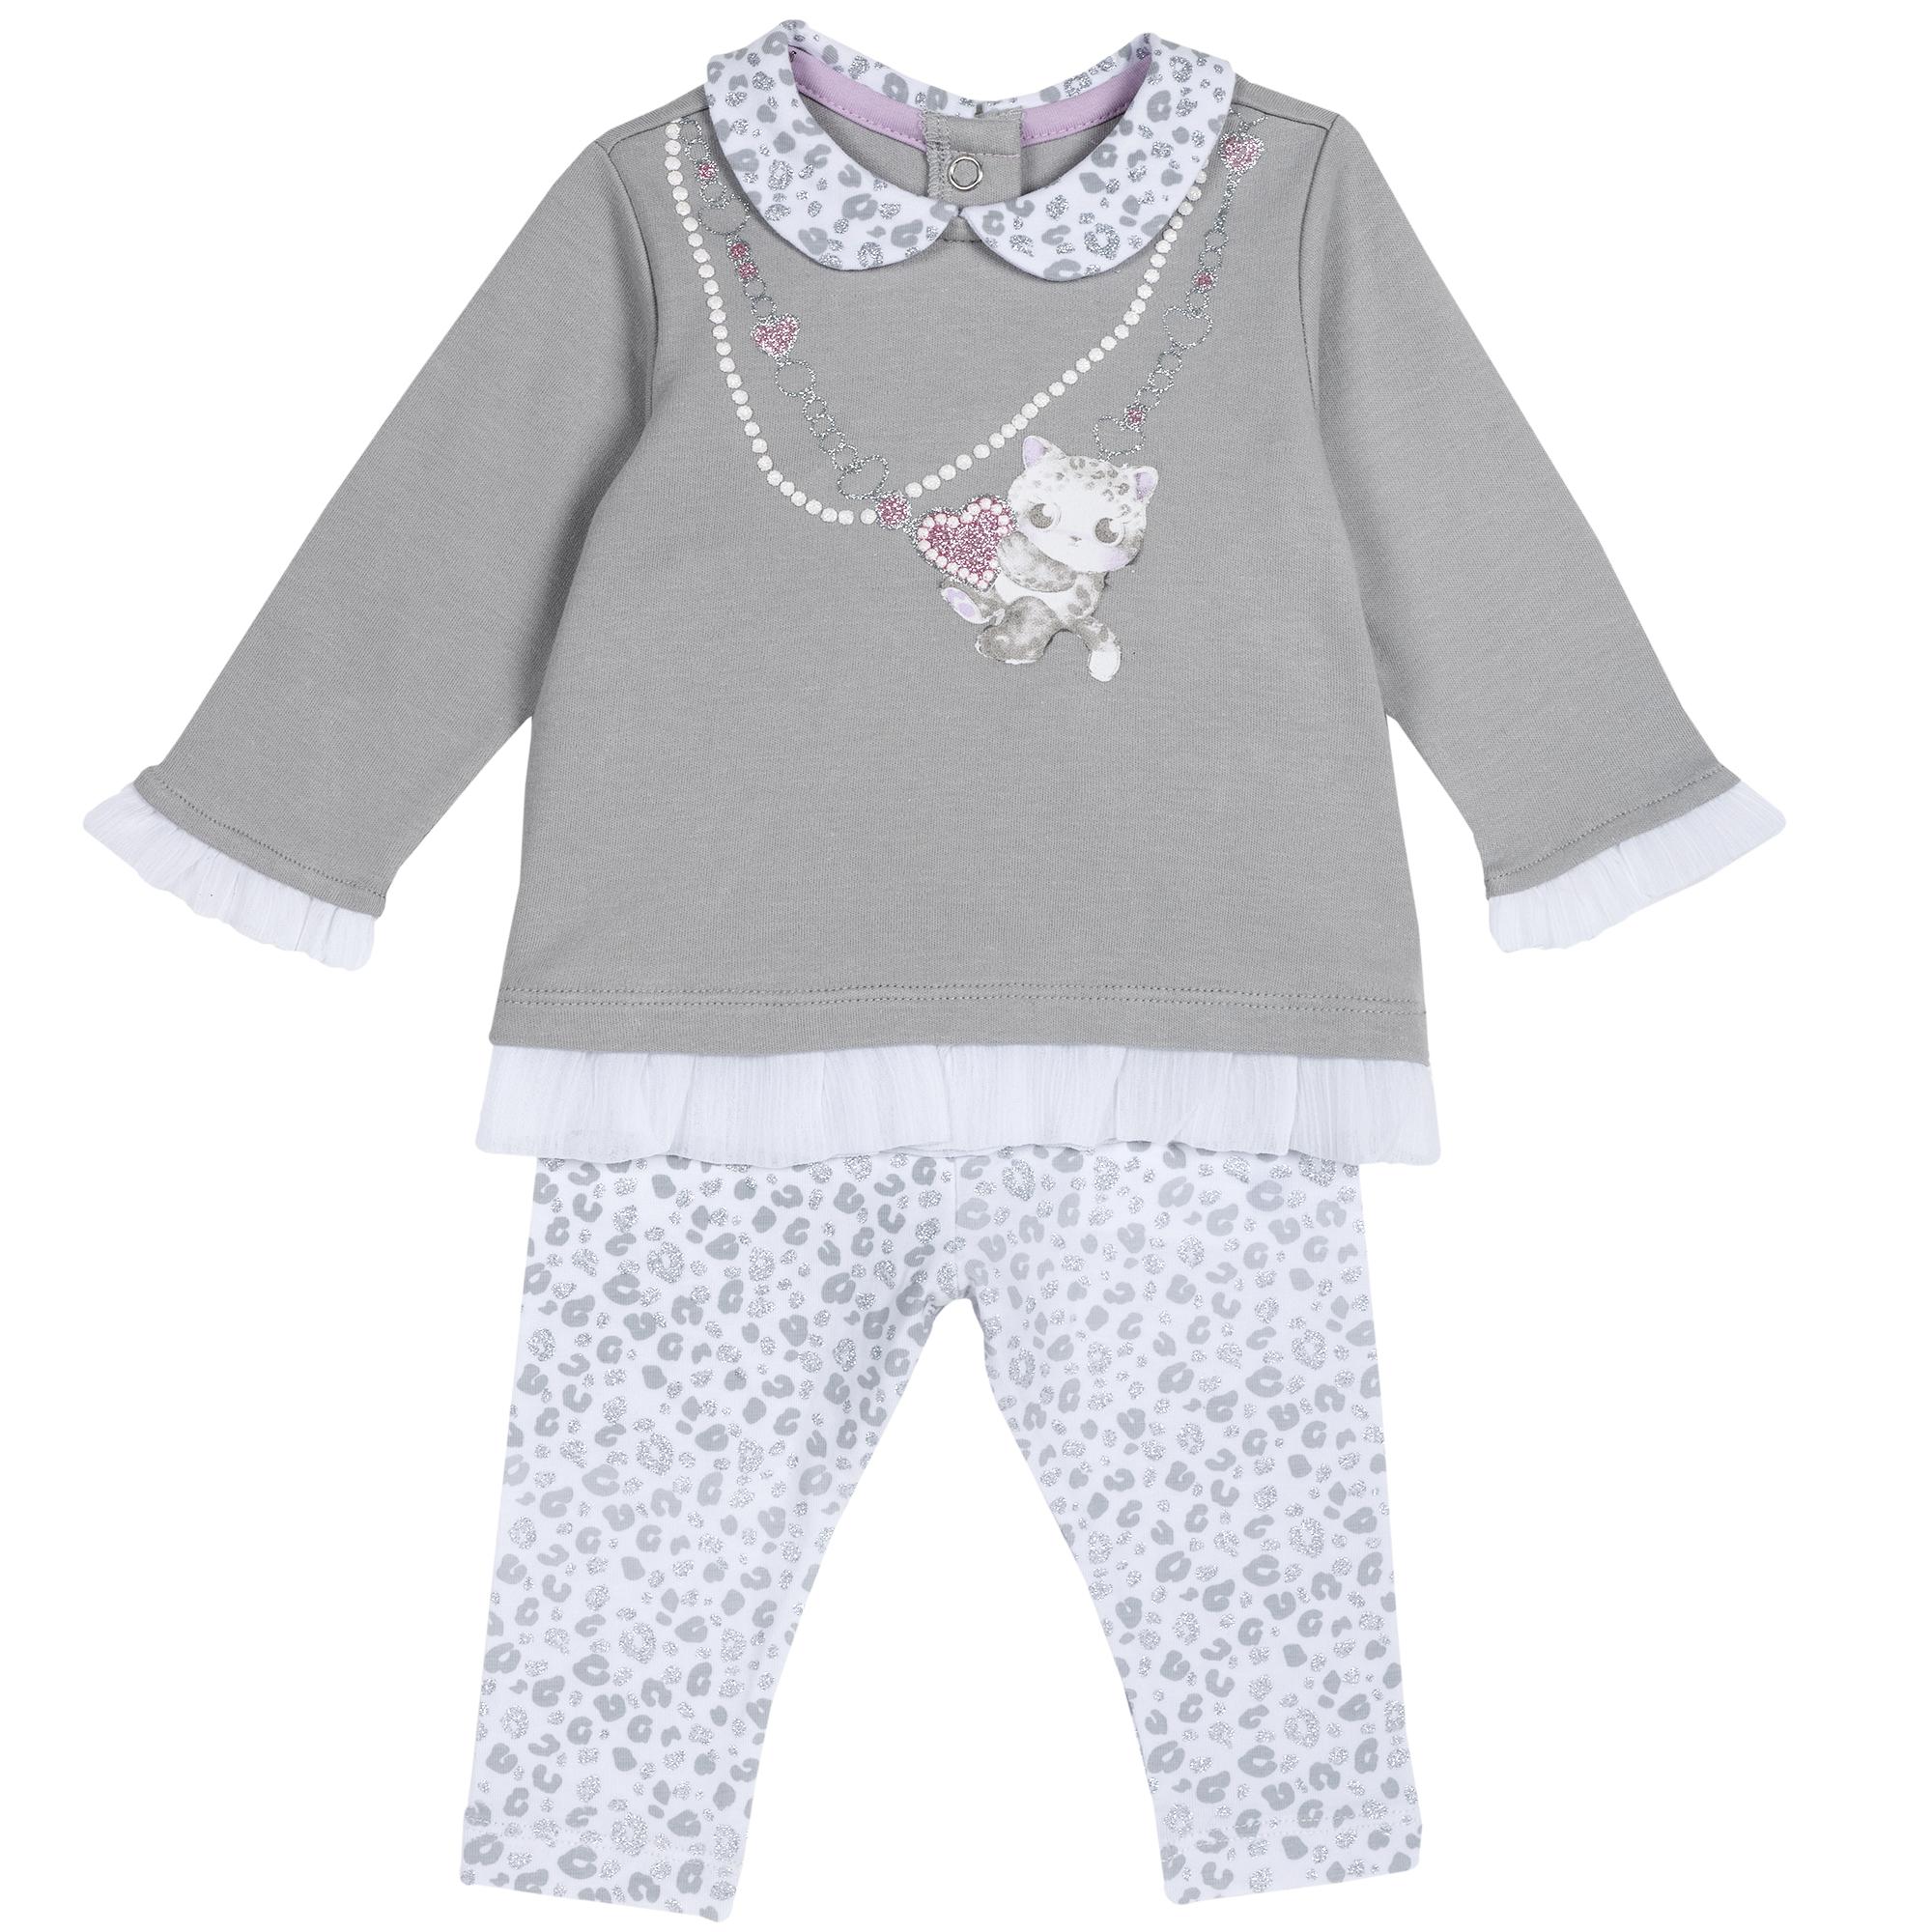 Set Bluza Si Pantaloni Copii Chicco, Gri Deschis, 77851 imagine